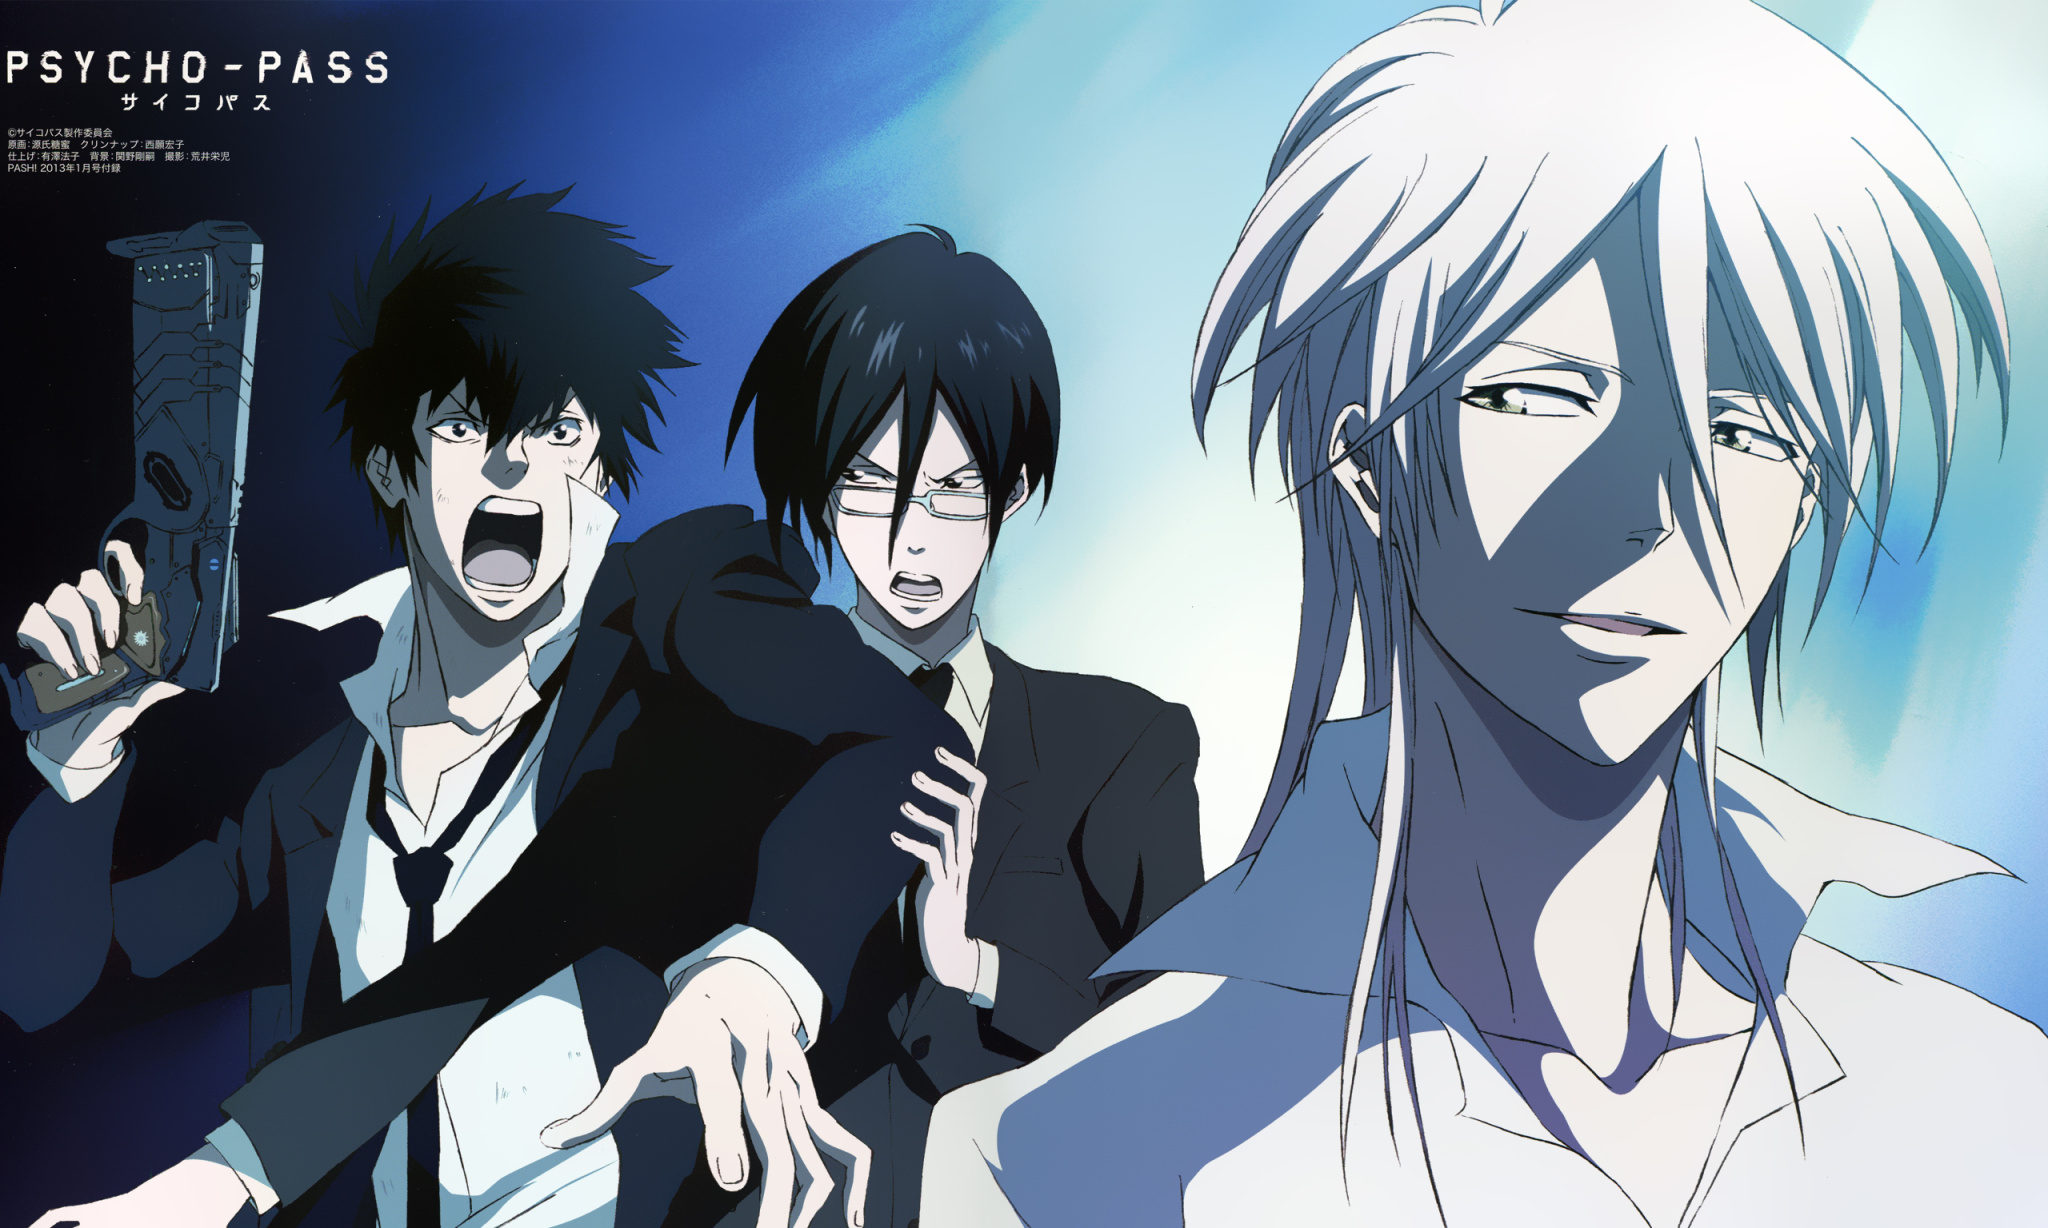 Psycho Pass Wallpaper Zerochan Anime Image Board